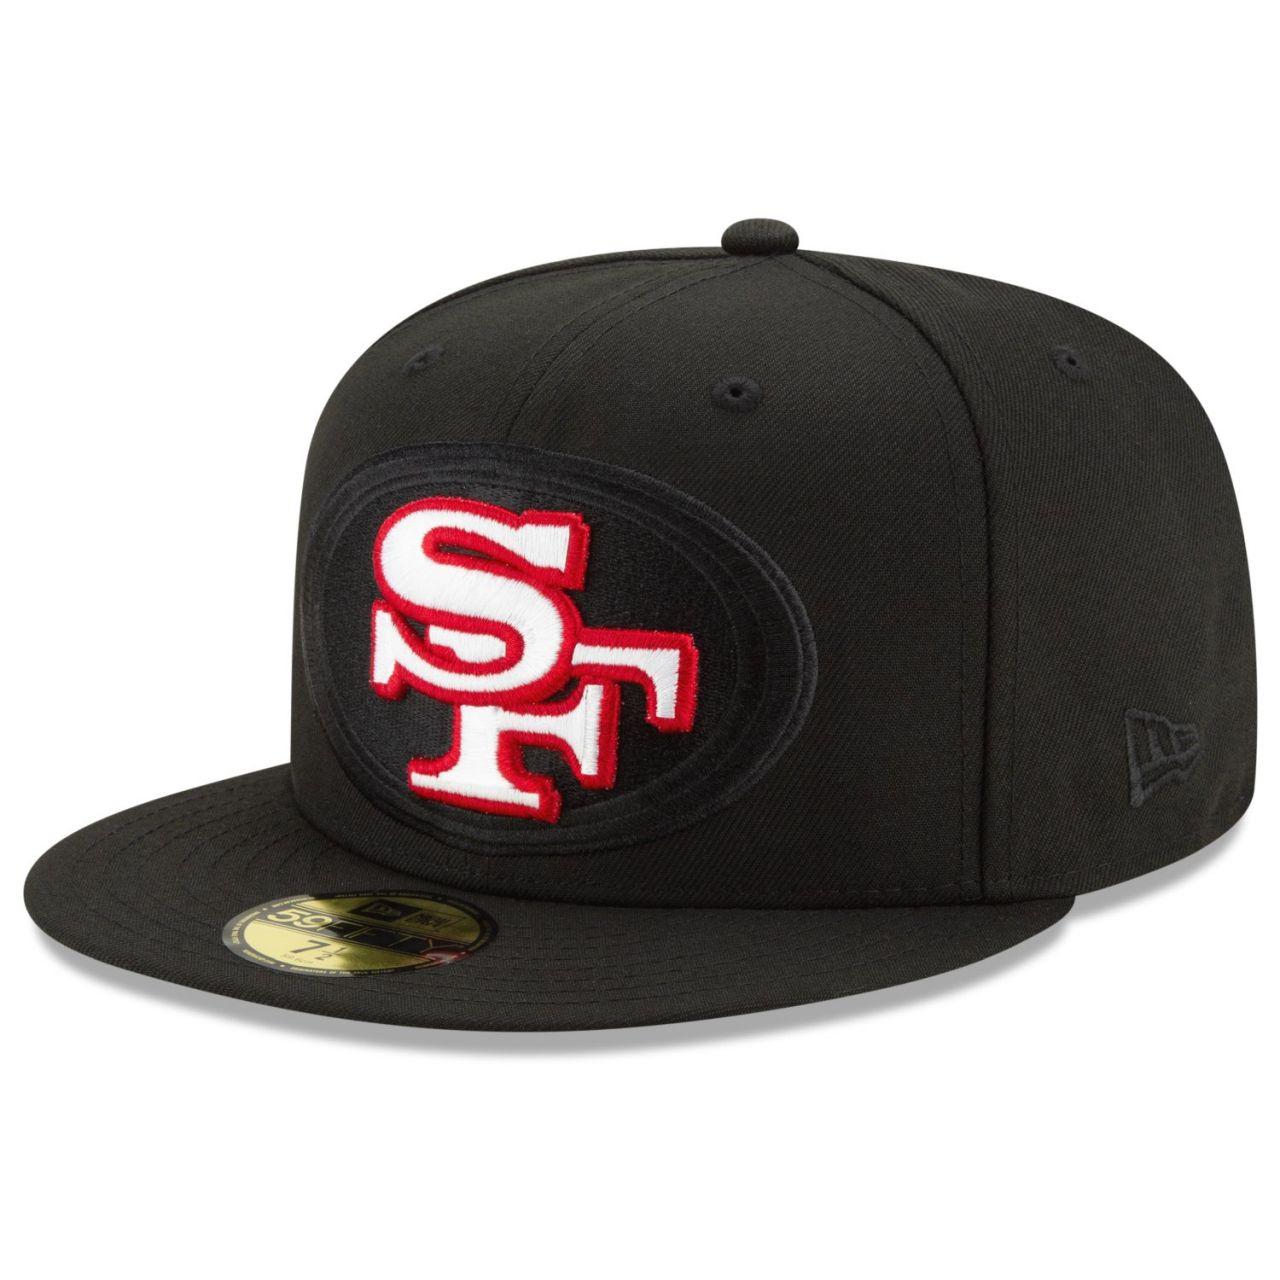 amfoo - New Era 59Fifty Fitted Cap - ELEMENTS San Francisco 49ers